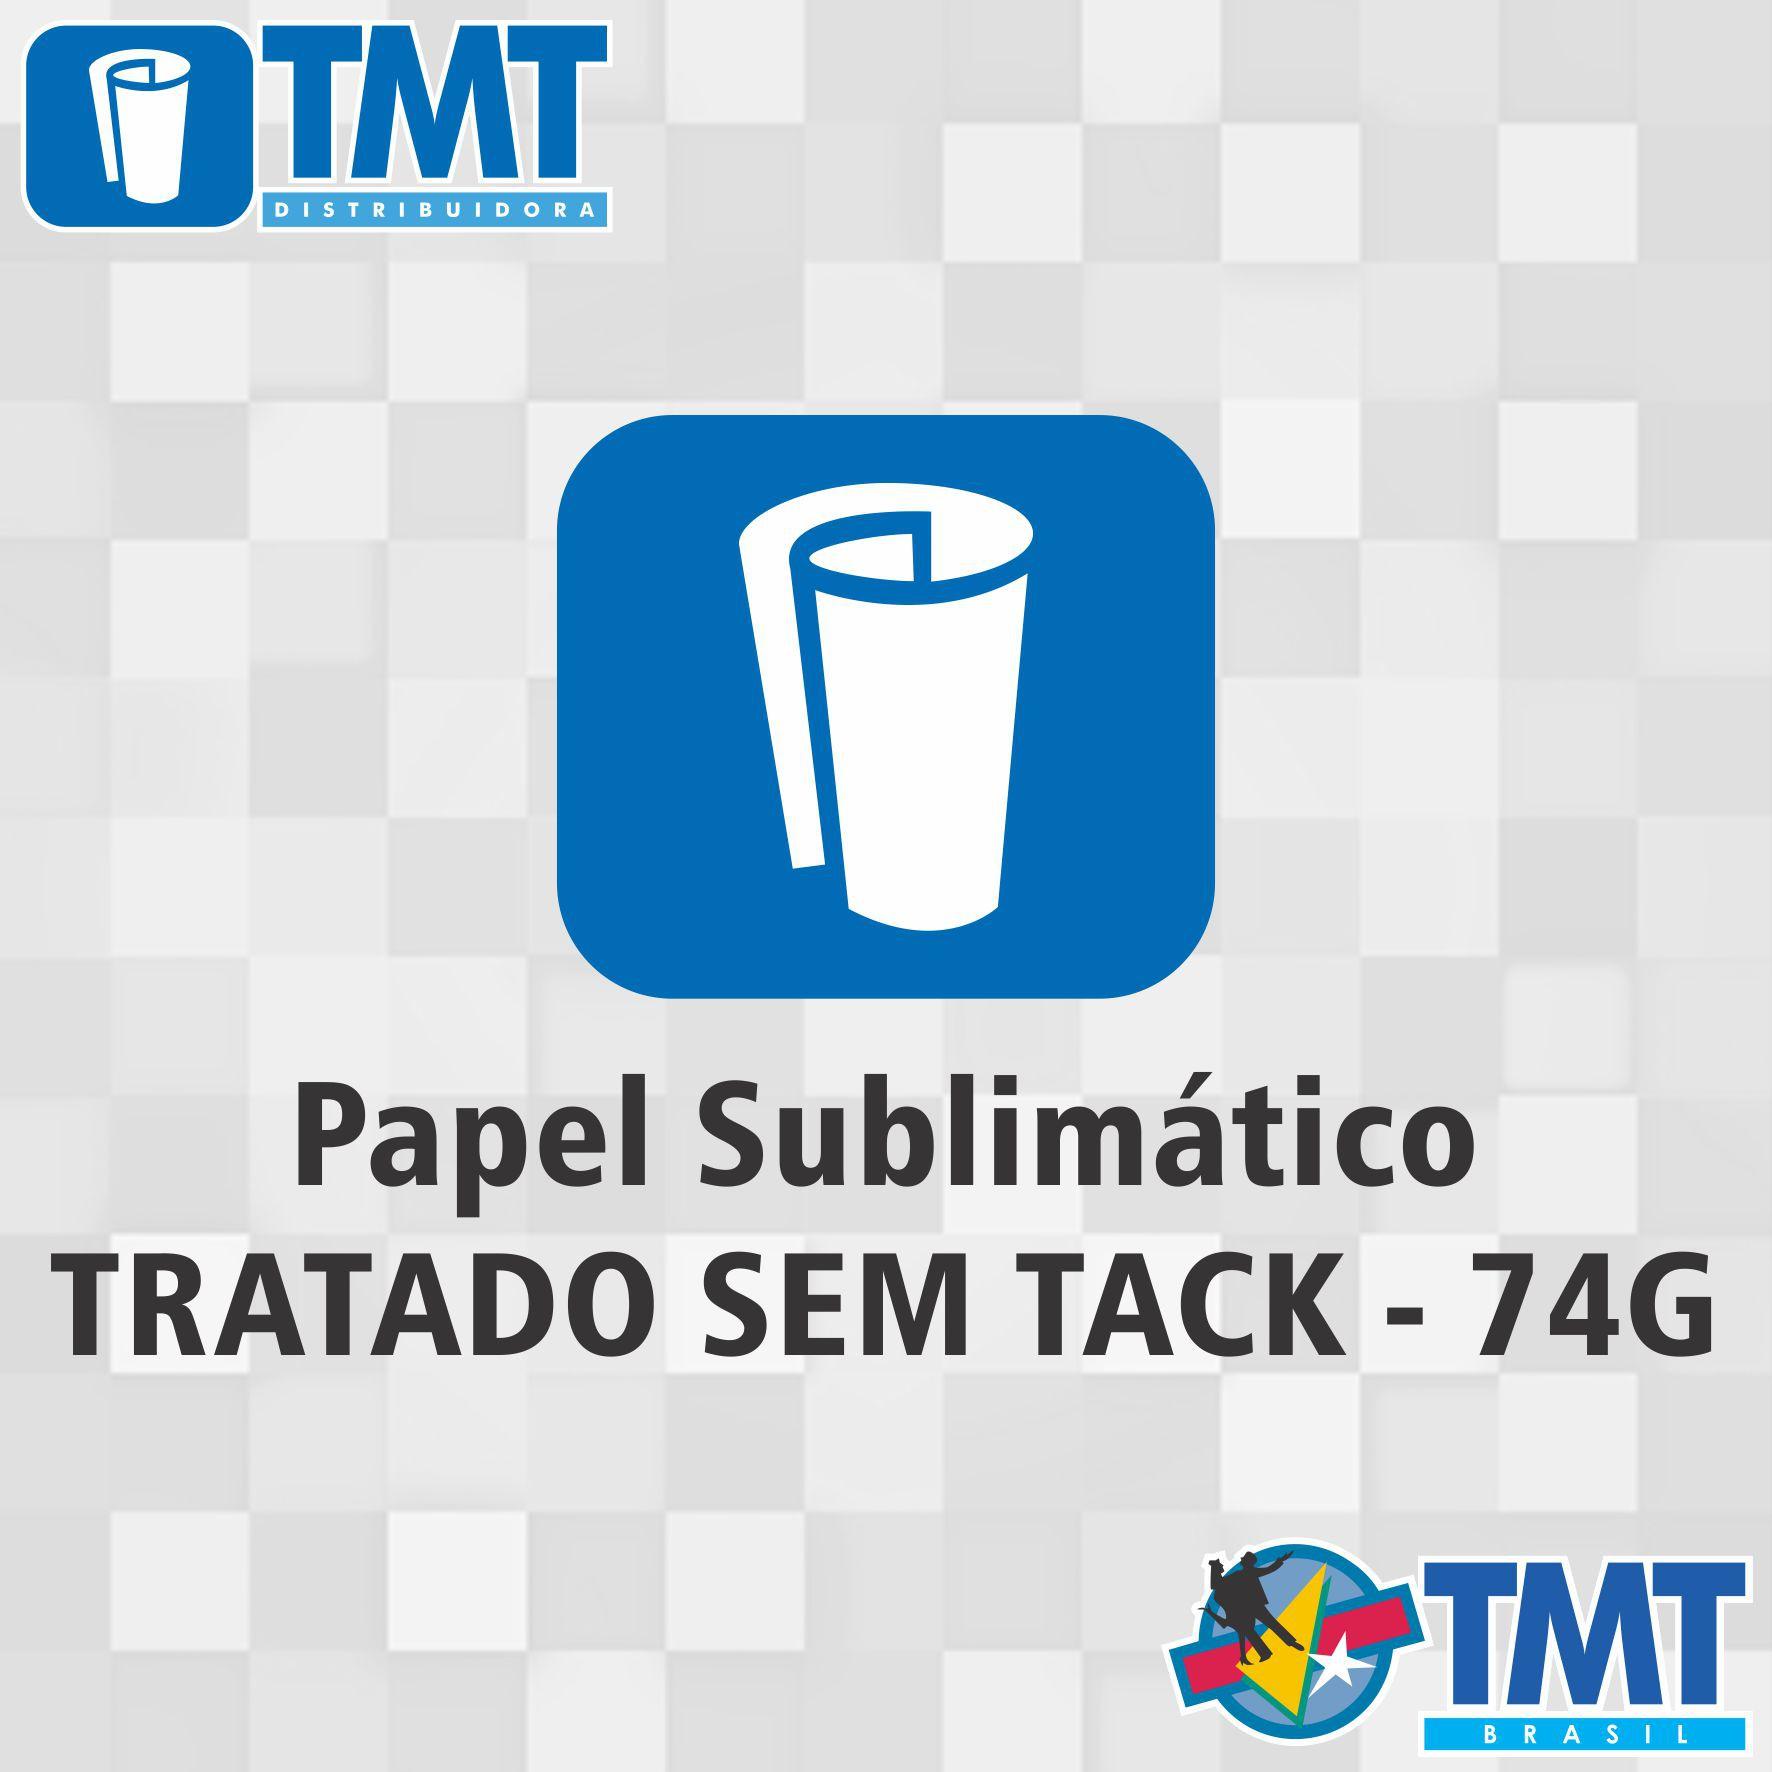 Papel Sublimático Tratado 74g Sem Tack - 1,10mt x 100mt